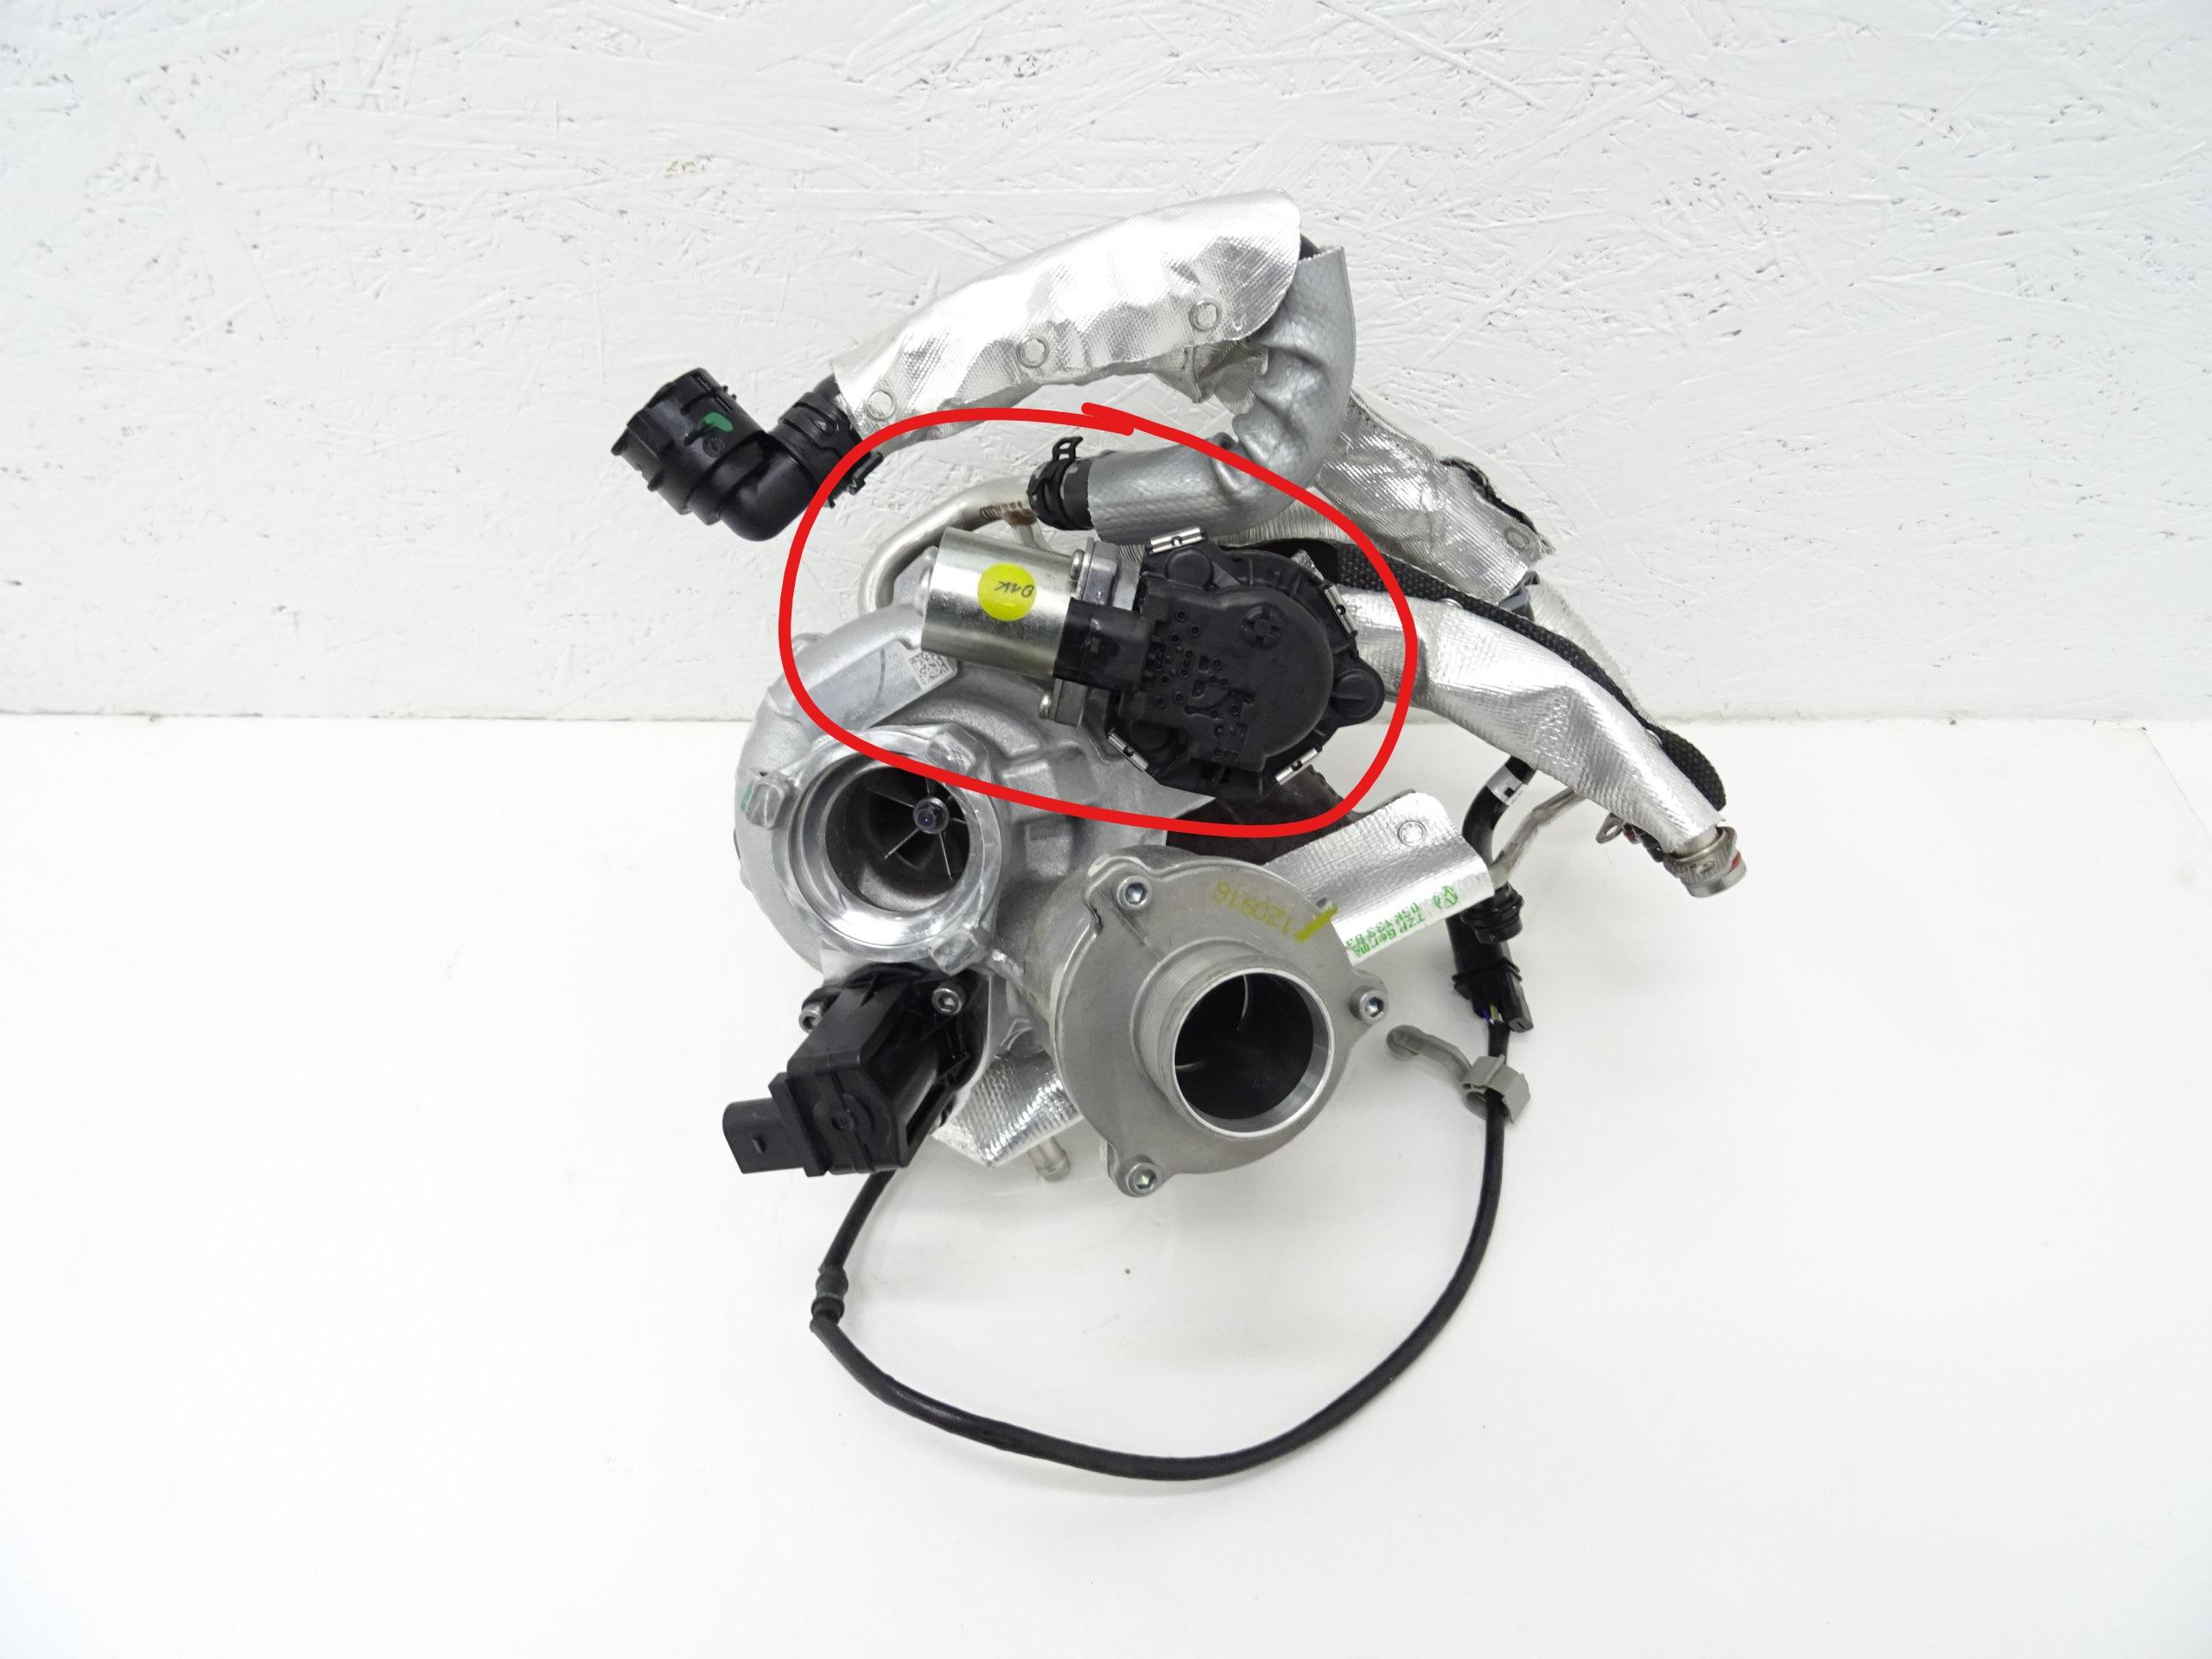 Turbo Problem HELP Required asap   Audi-Sport net